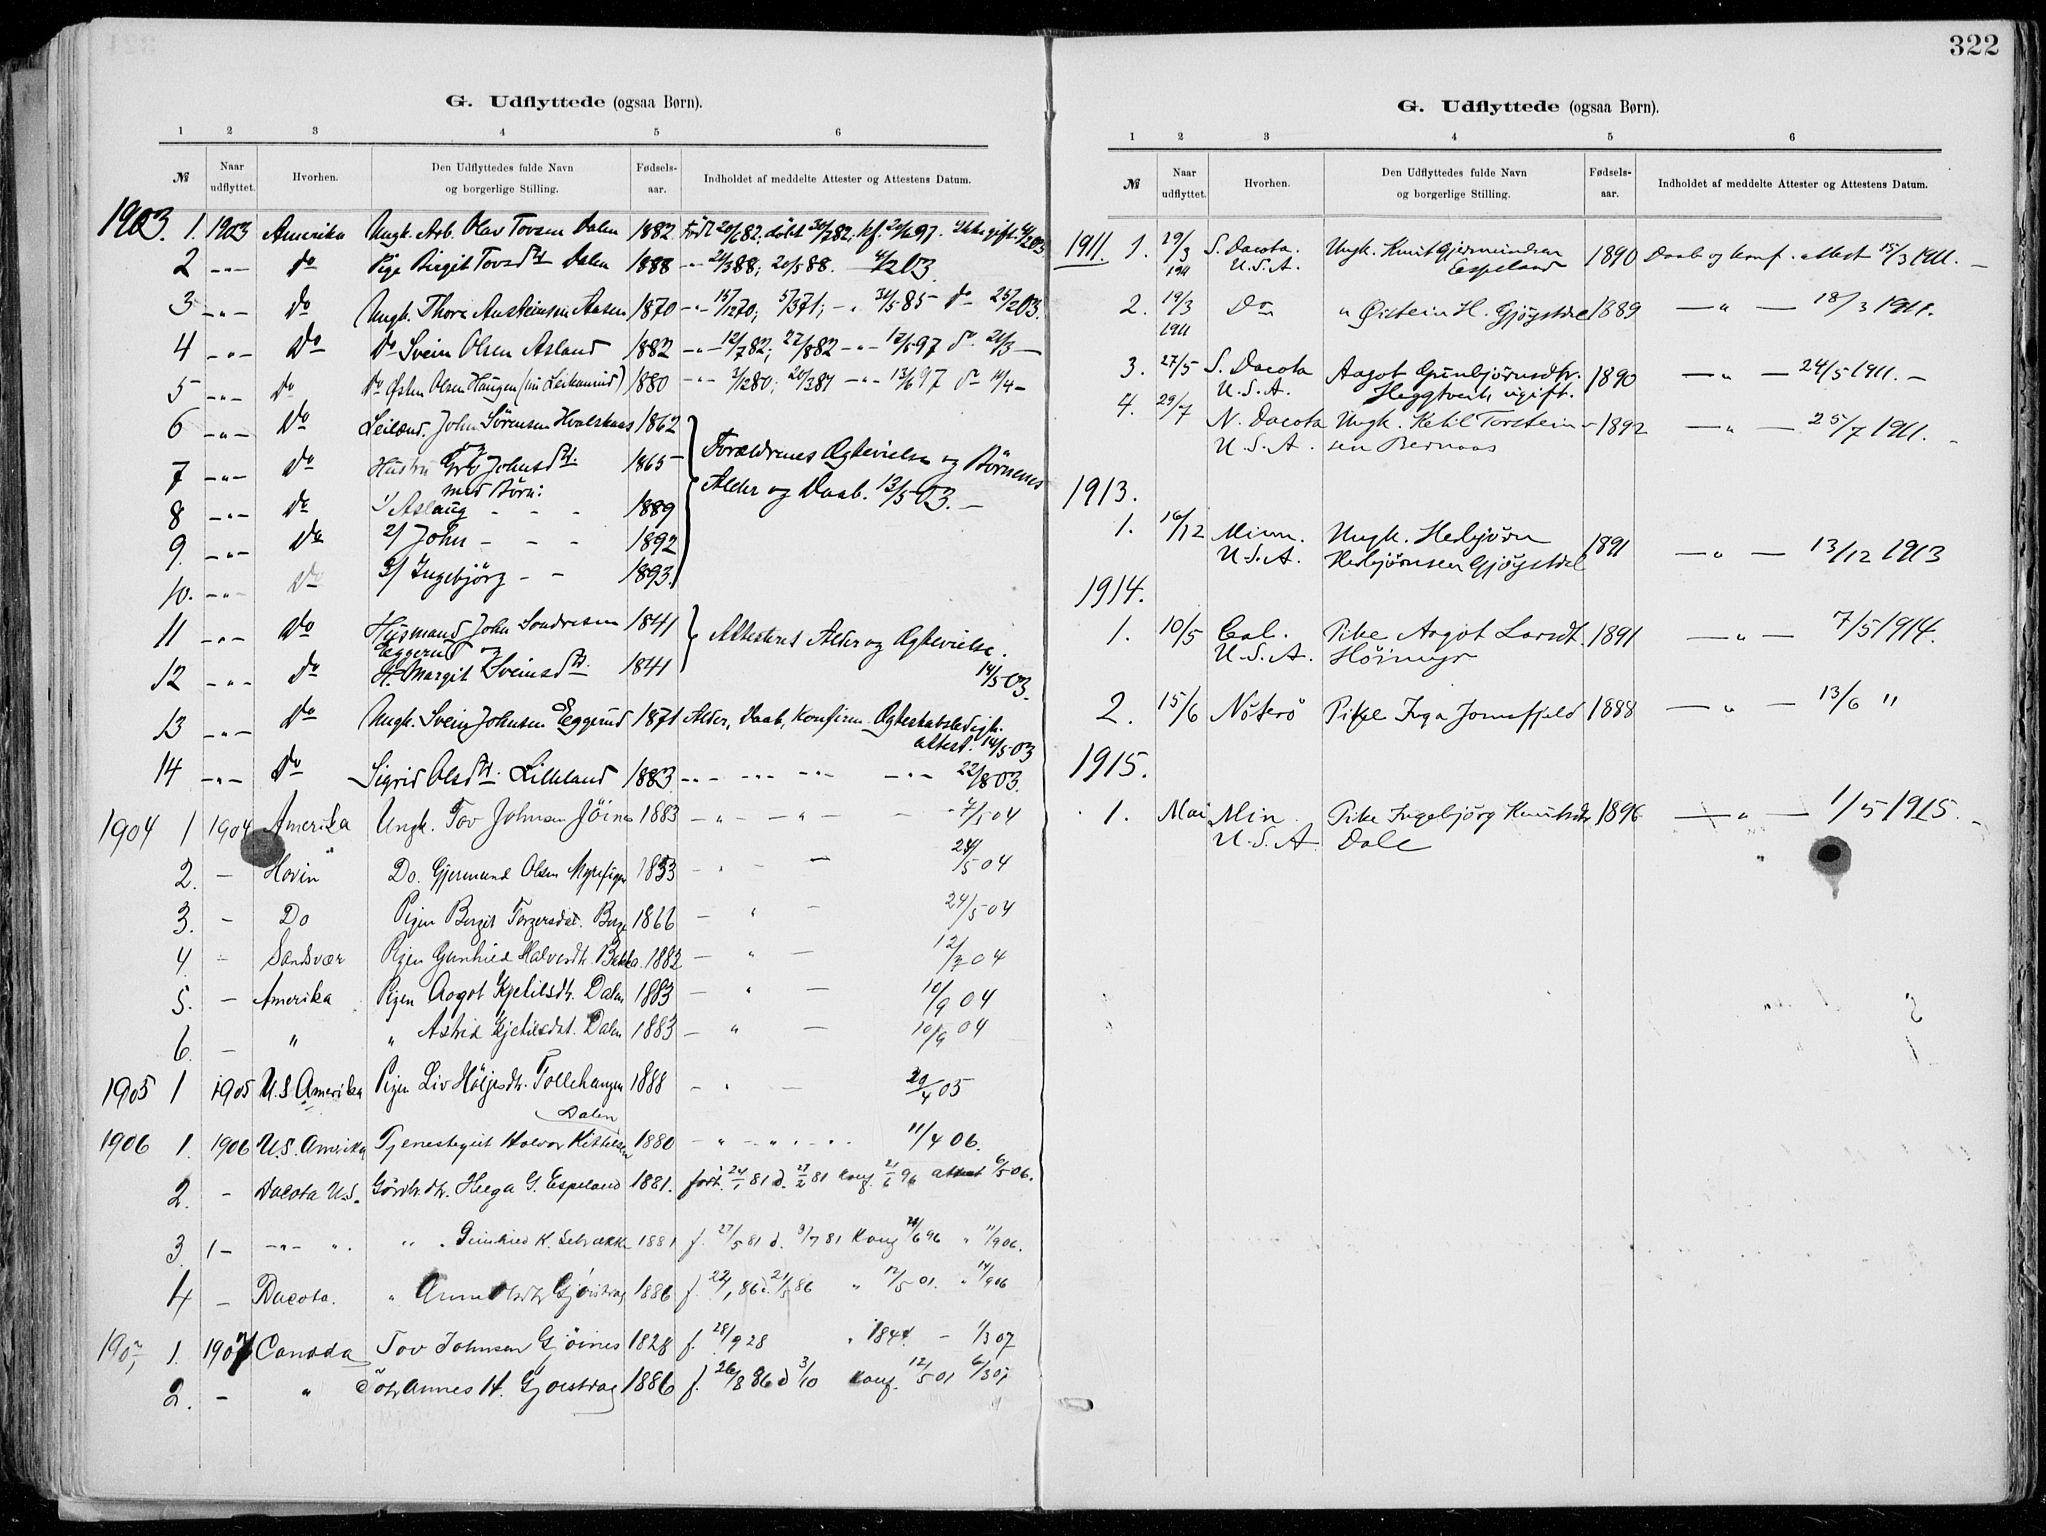 SAKO, Tinn kirkebøker, F/Fa/L0007: Ministerialbok nr. I 7, 1878-1922, s. 322